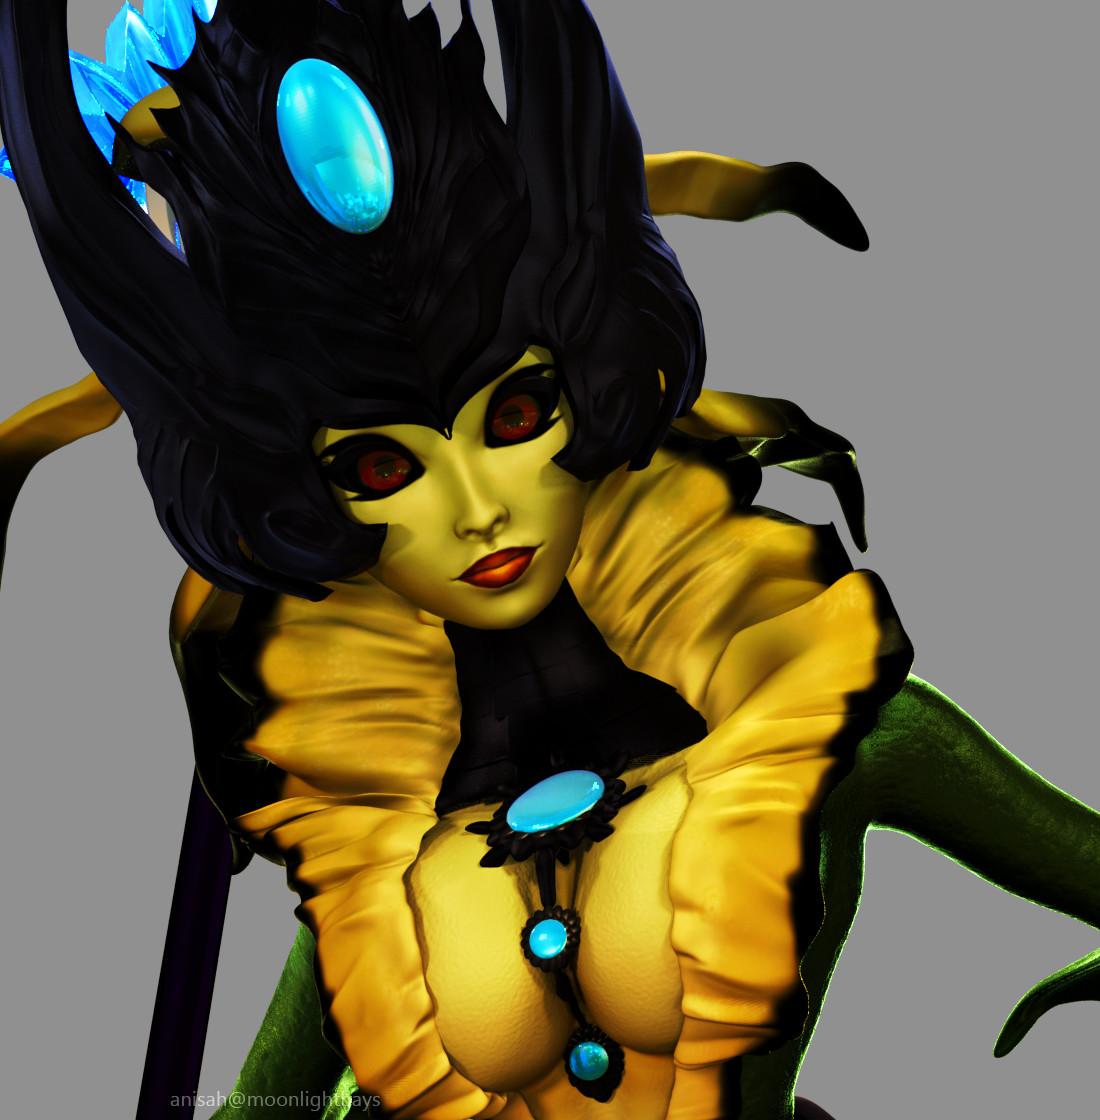 Fanart - Nami from League of Legends